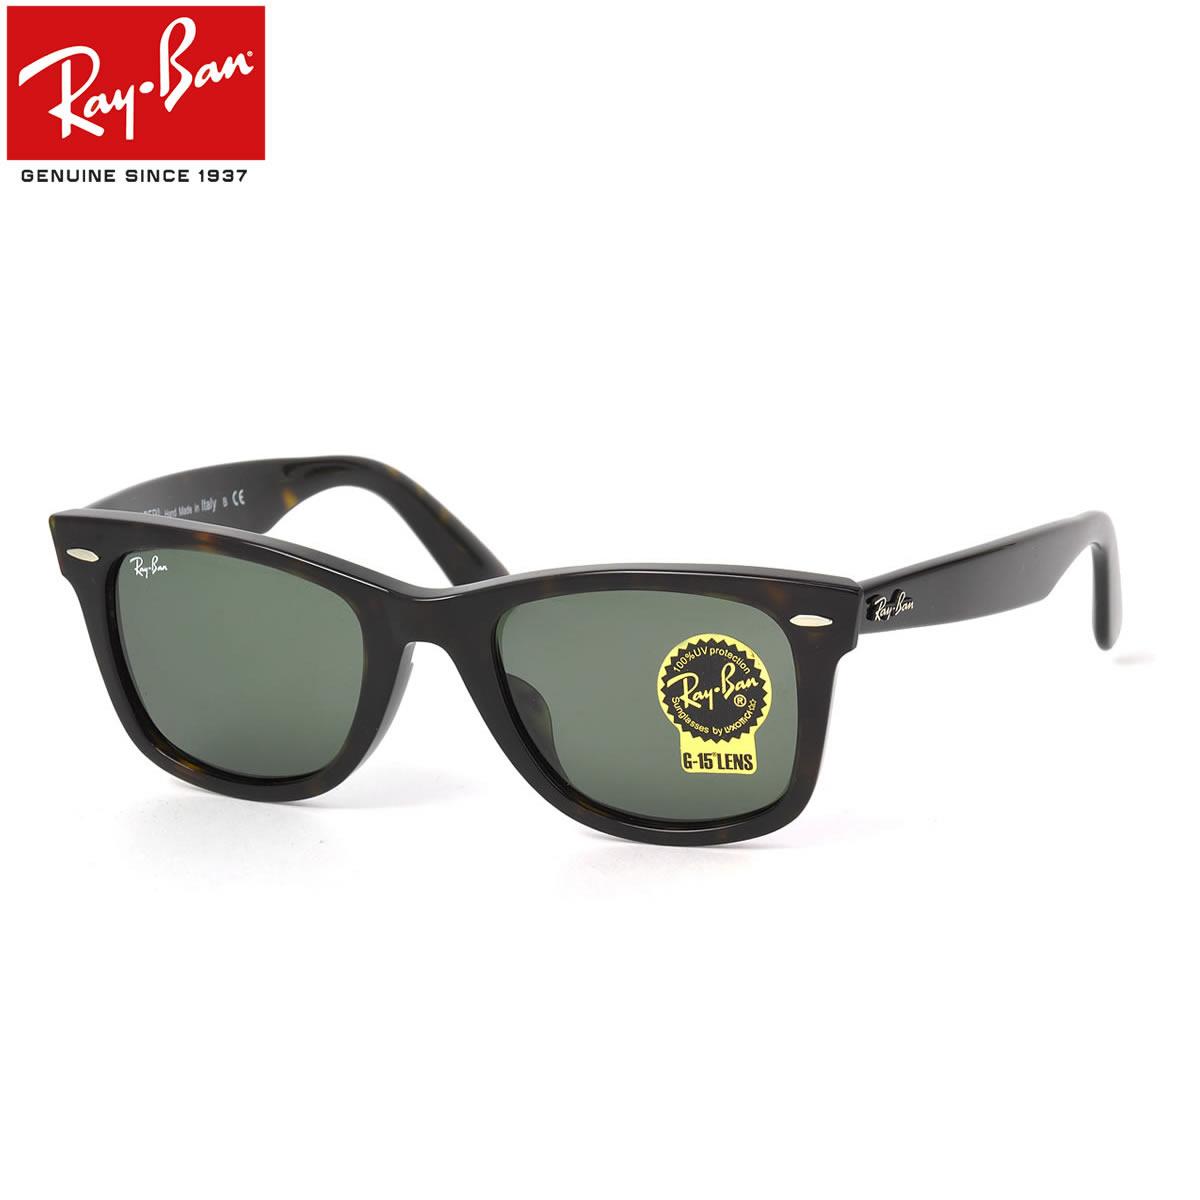 5f05c184c00b Ray-Ban sunglasses way Farrar Ray-Ban RB2140F 902 52 size 54 size Ray ...